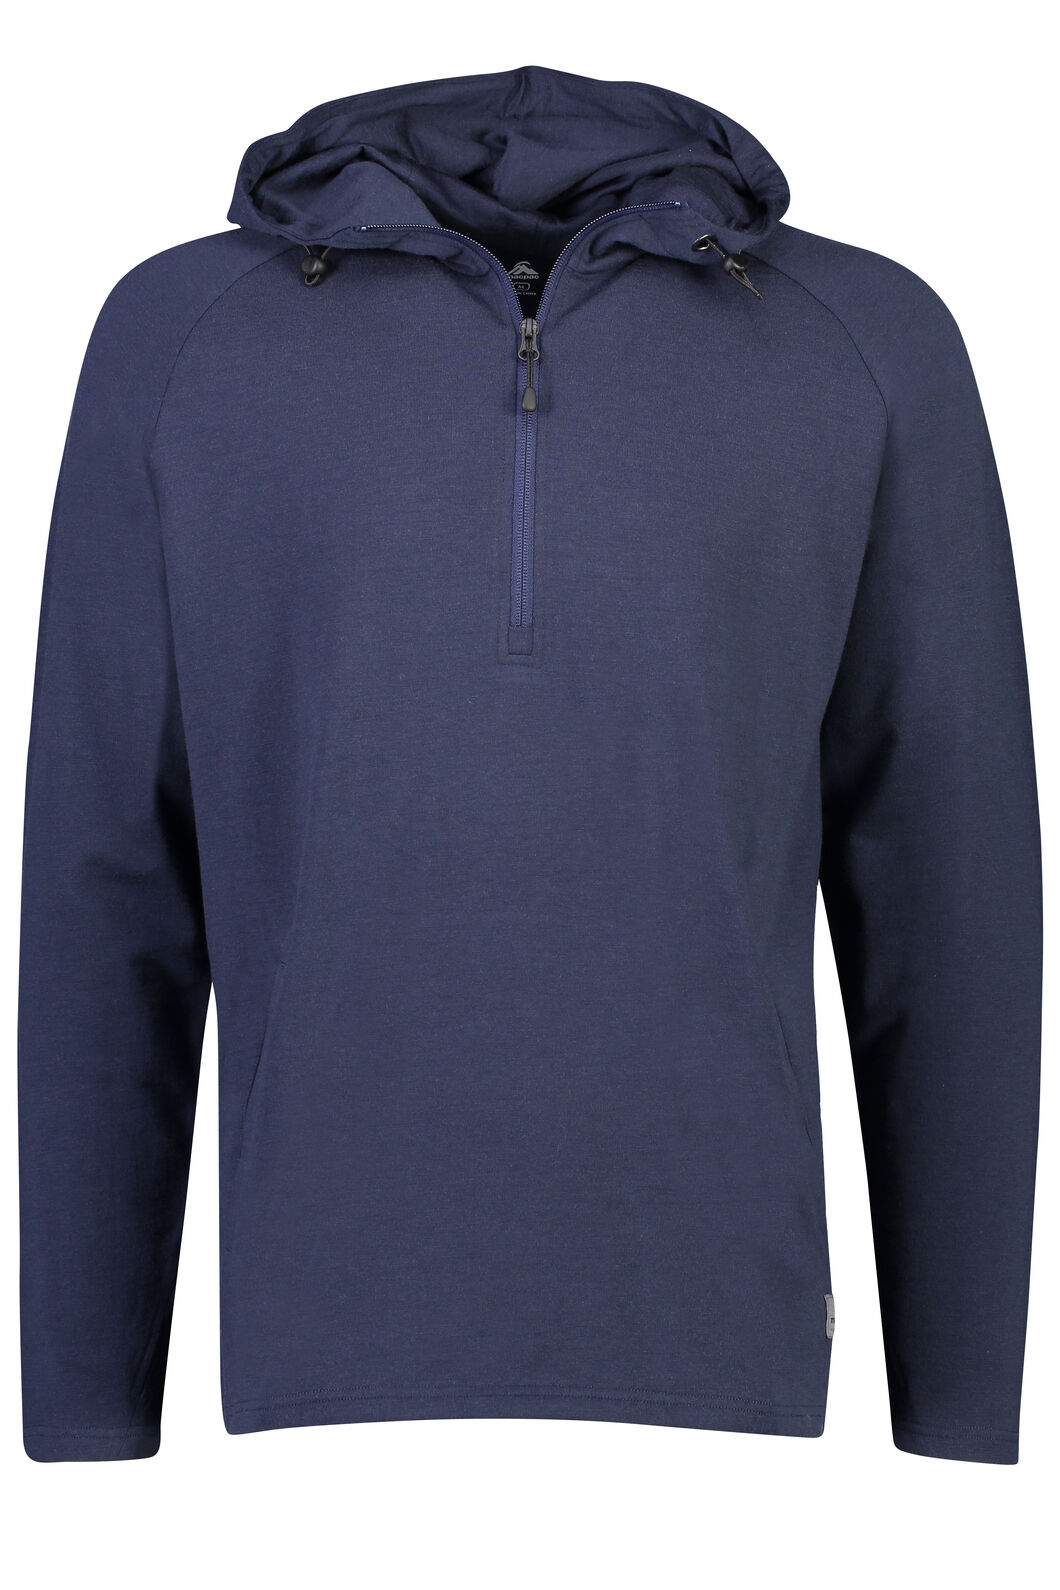 Macpac Merino 230 Long Sleeve Hoody - Men's, Black Iris, hi-res